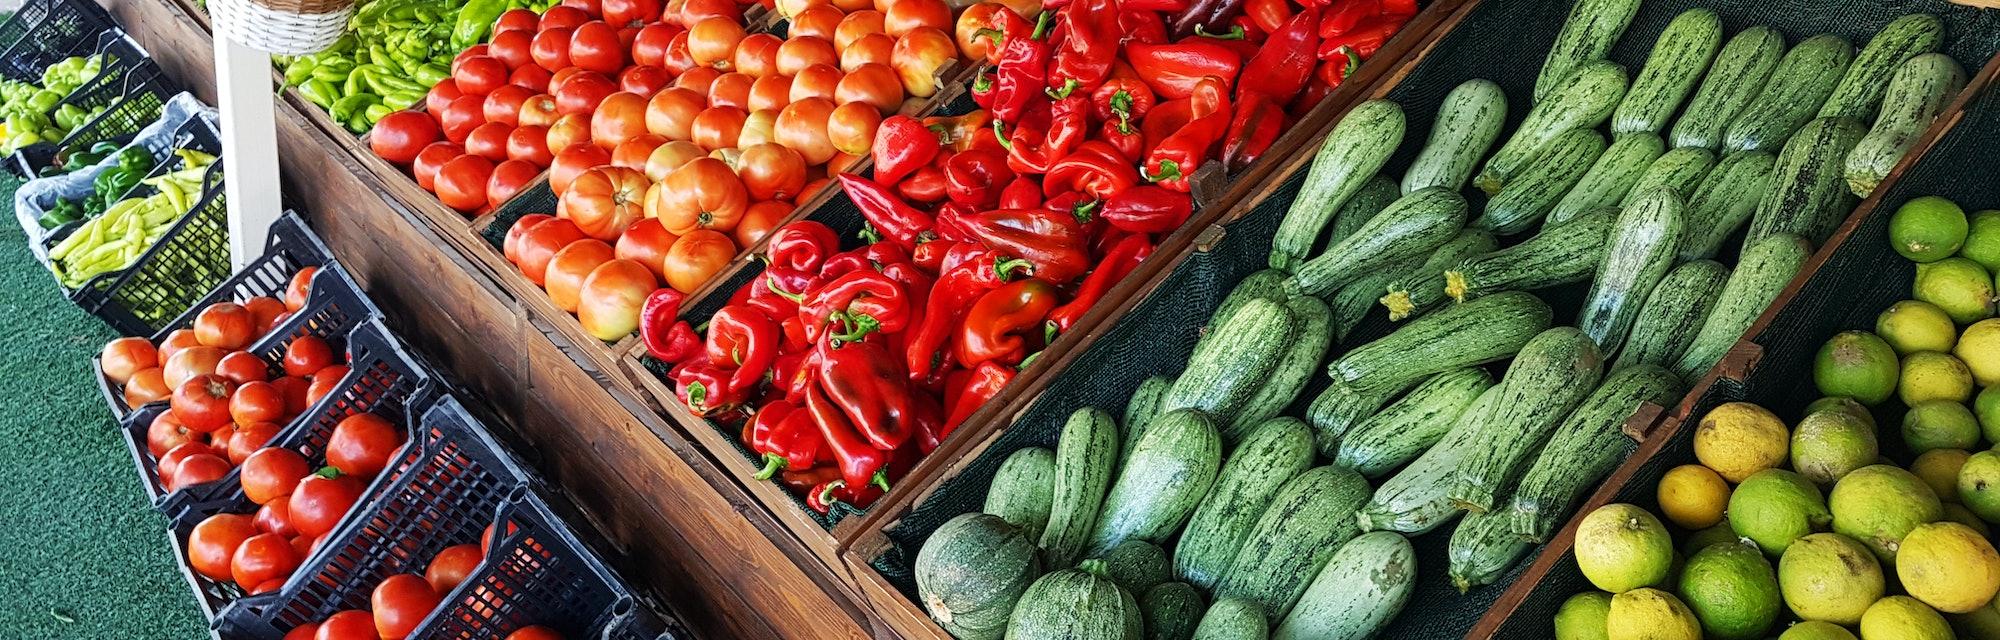 grocery market fruits vegetabes greece for background